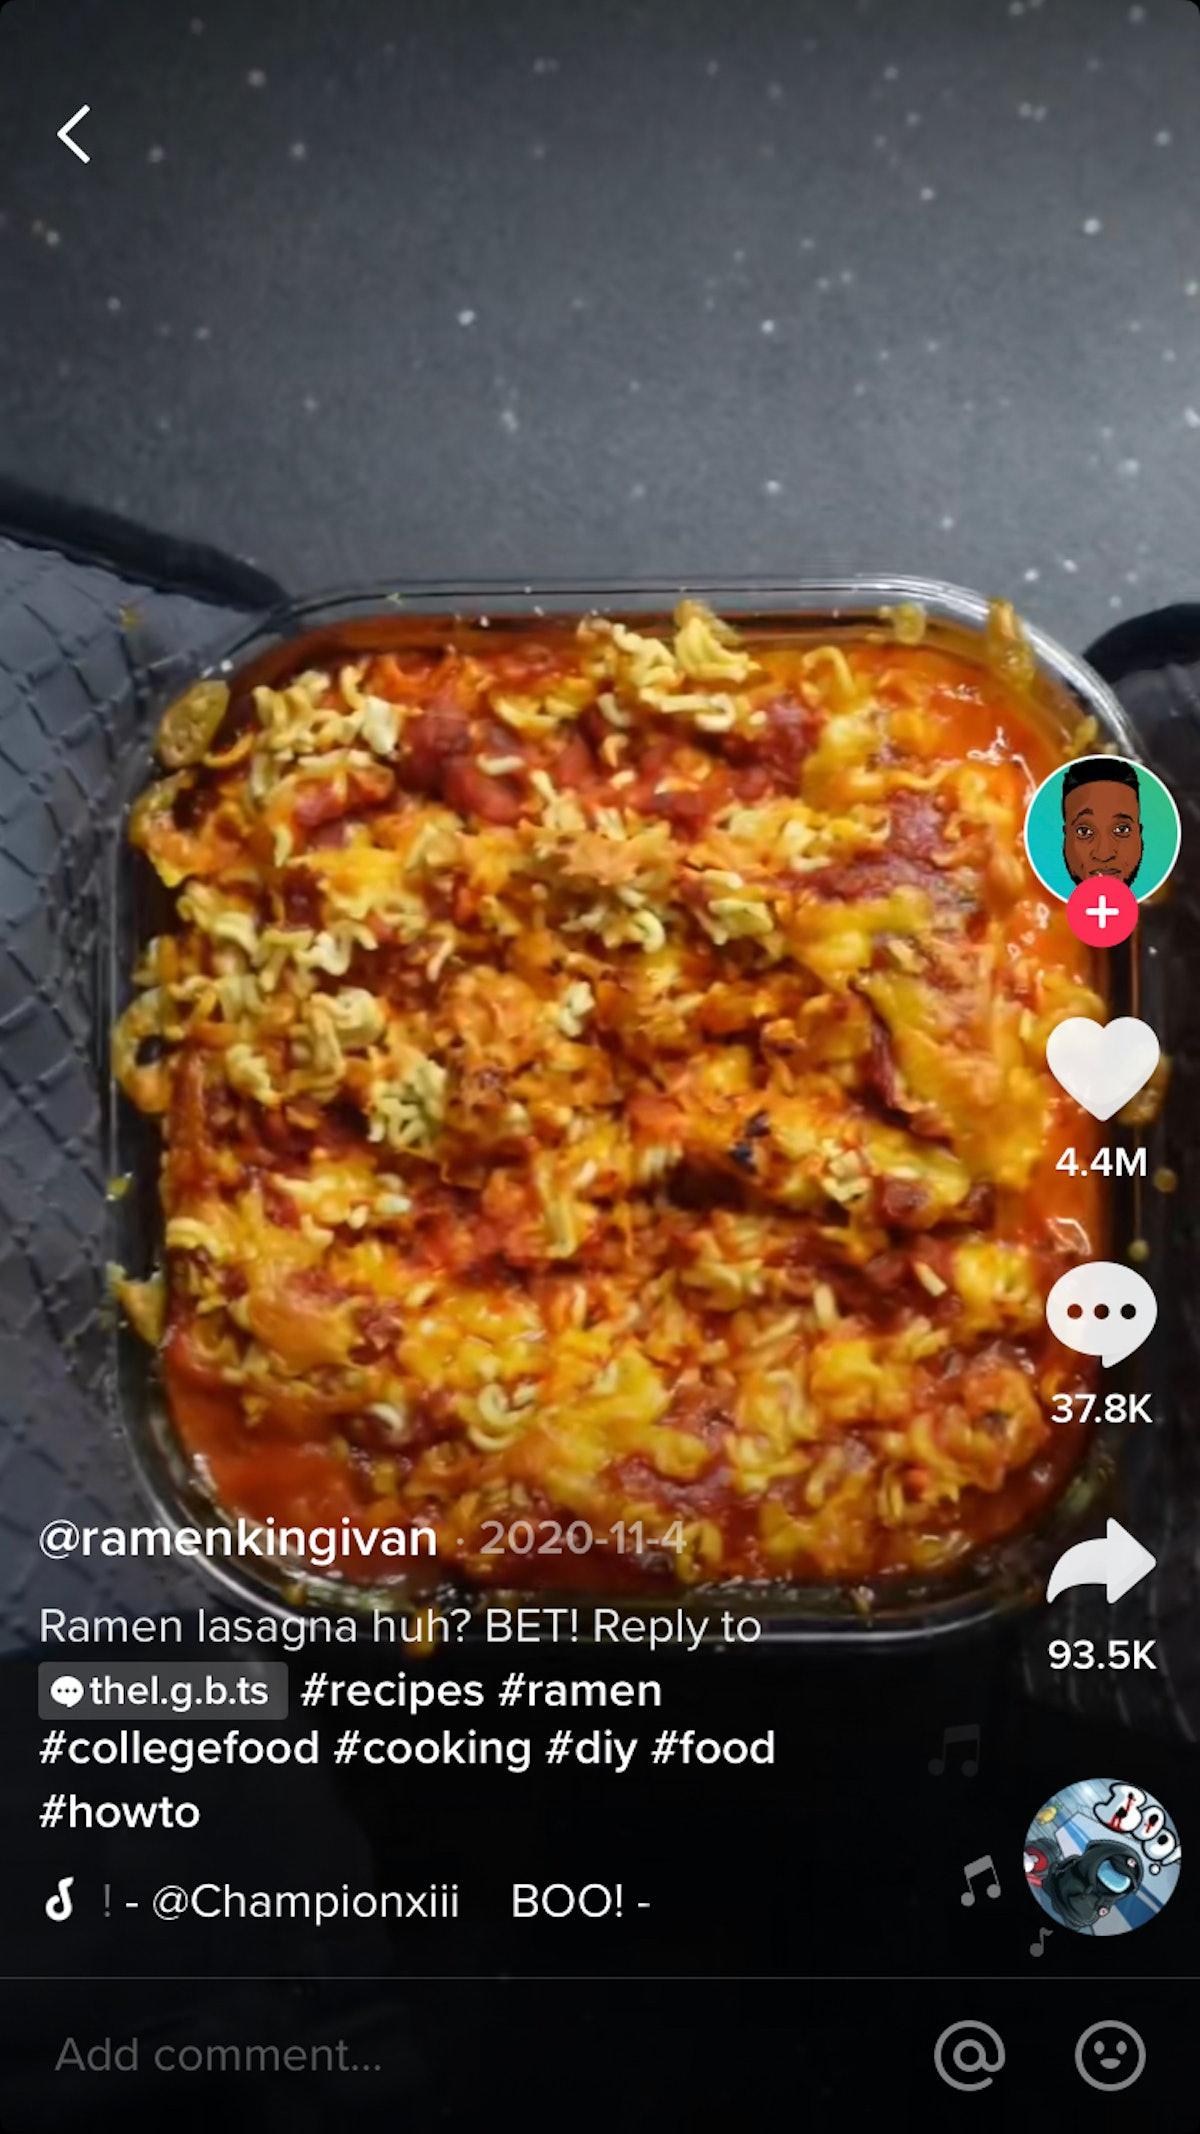 A TikTok recipe using ramen to make lasagna